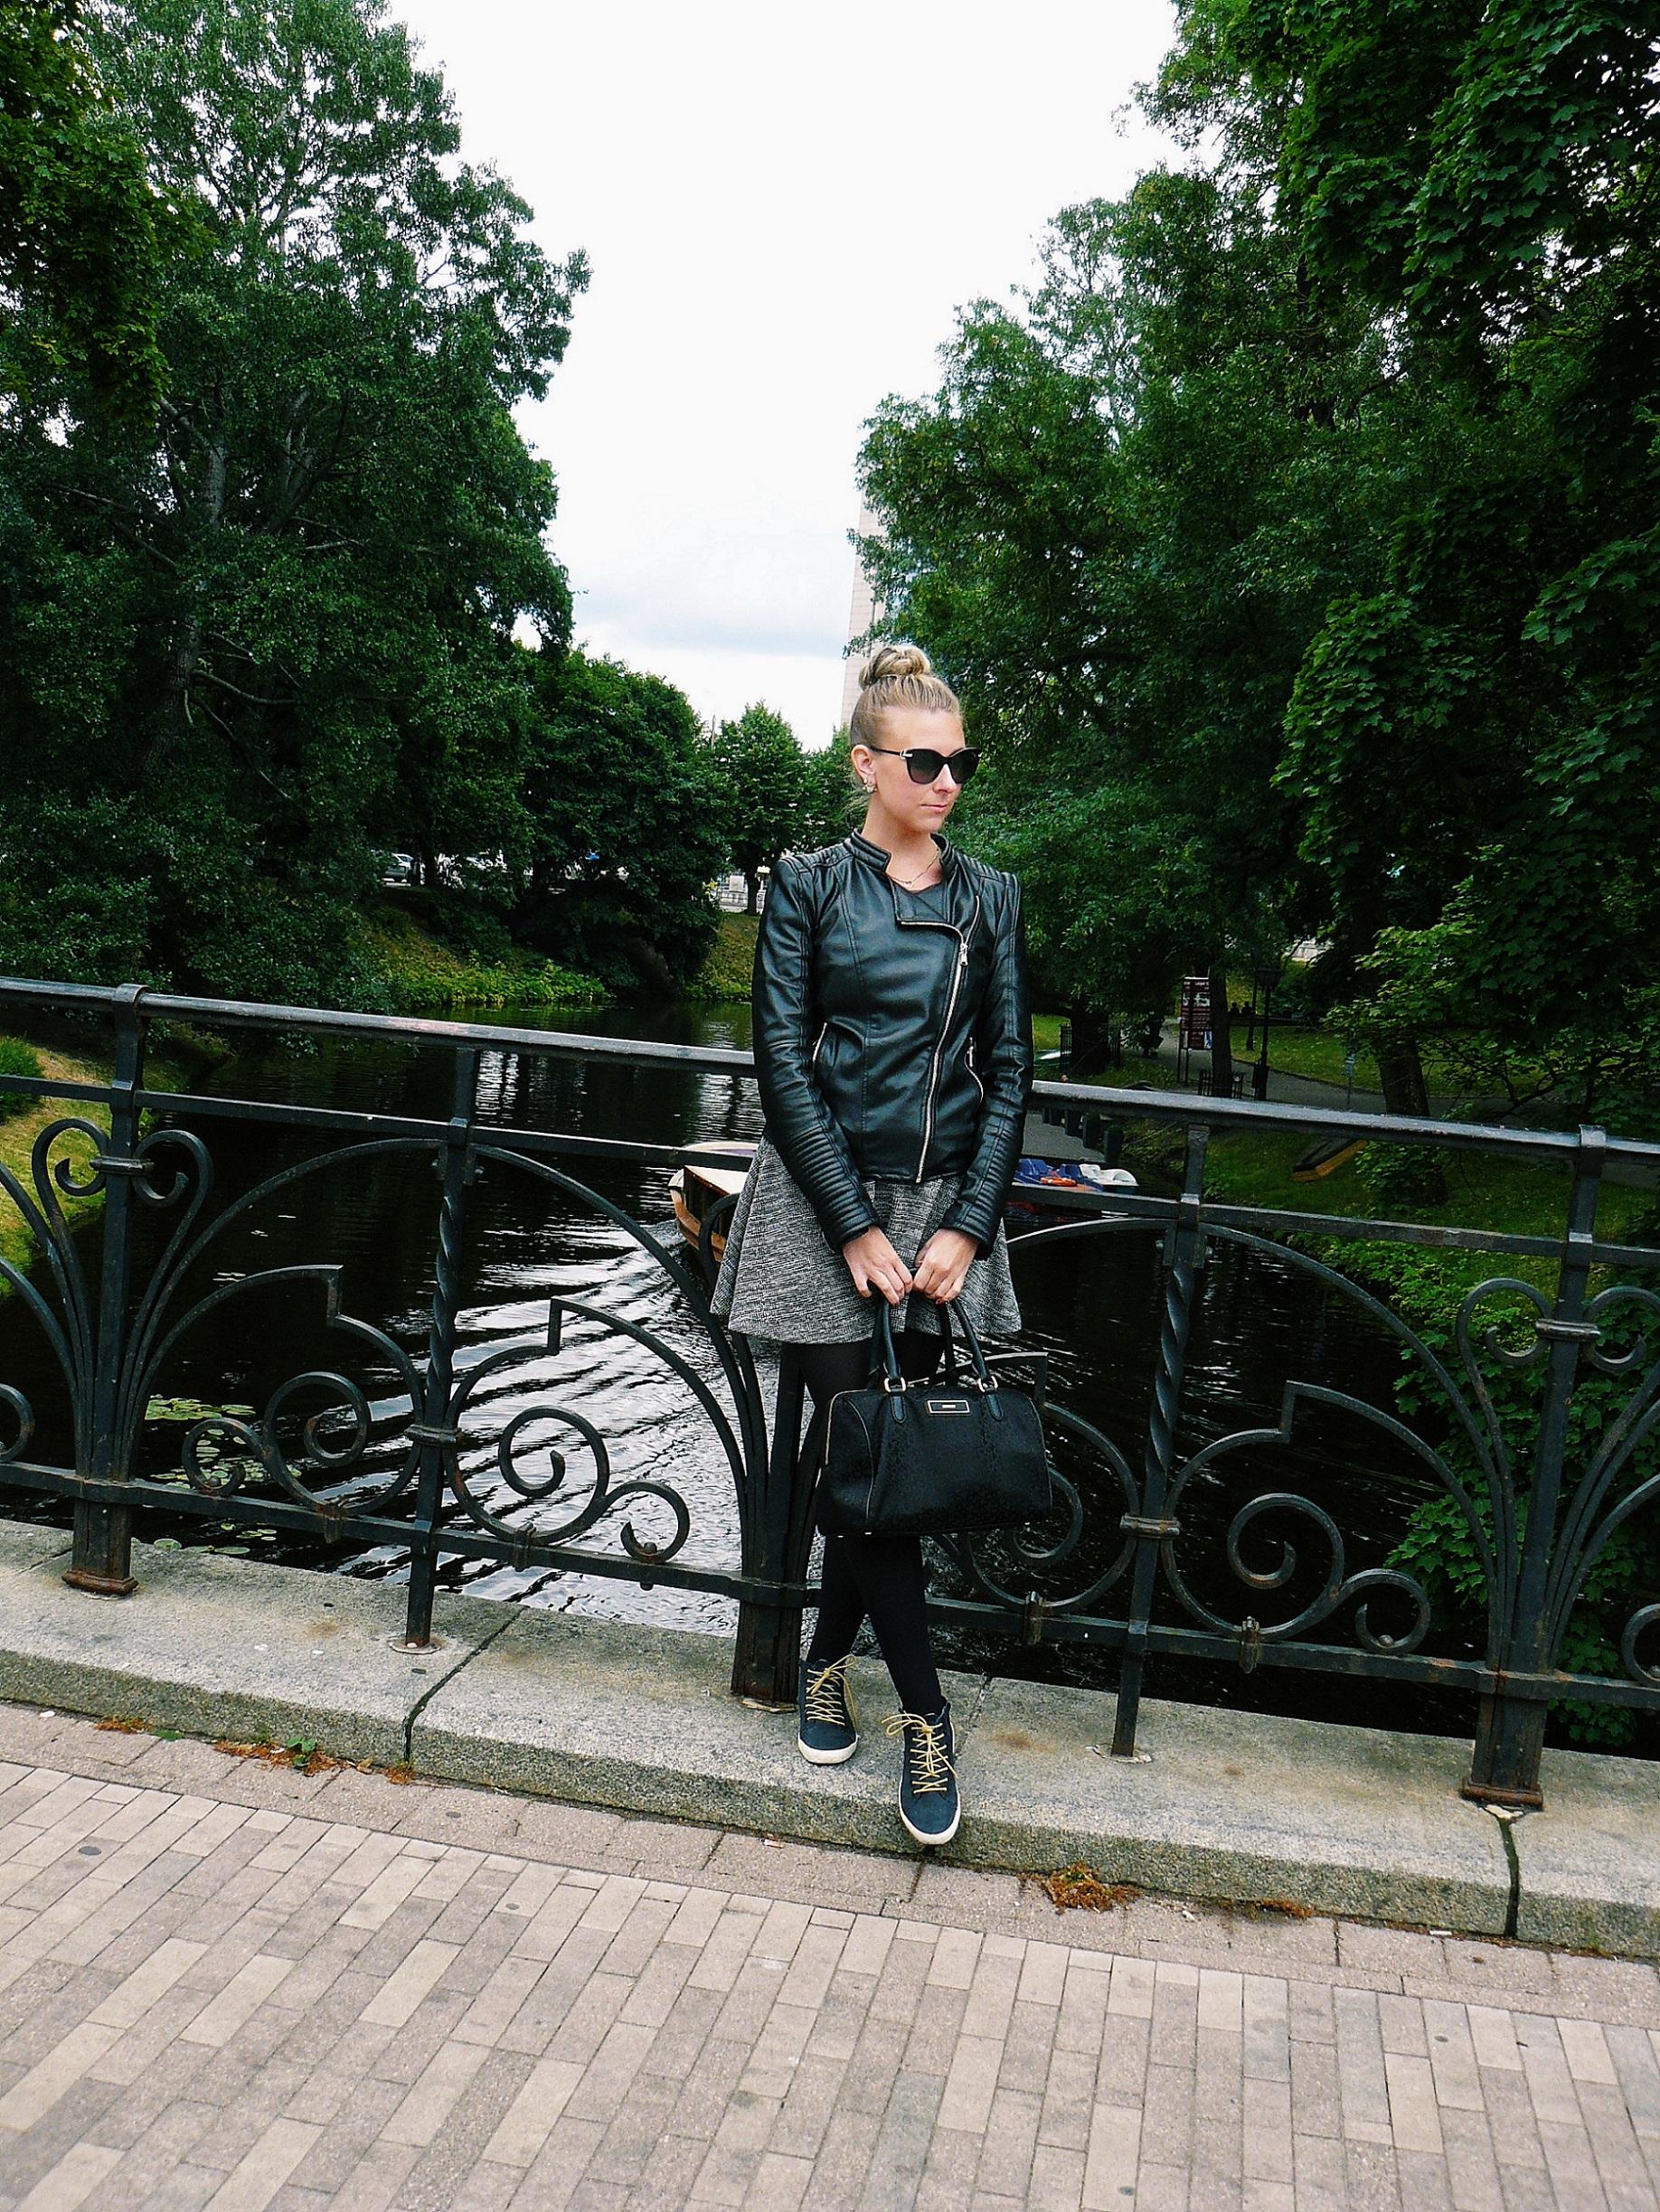 Outlandish blog travel Riga Latvia Midsummer stories what I wore